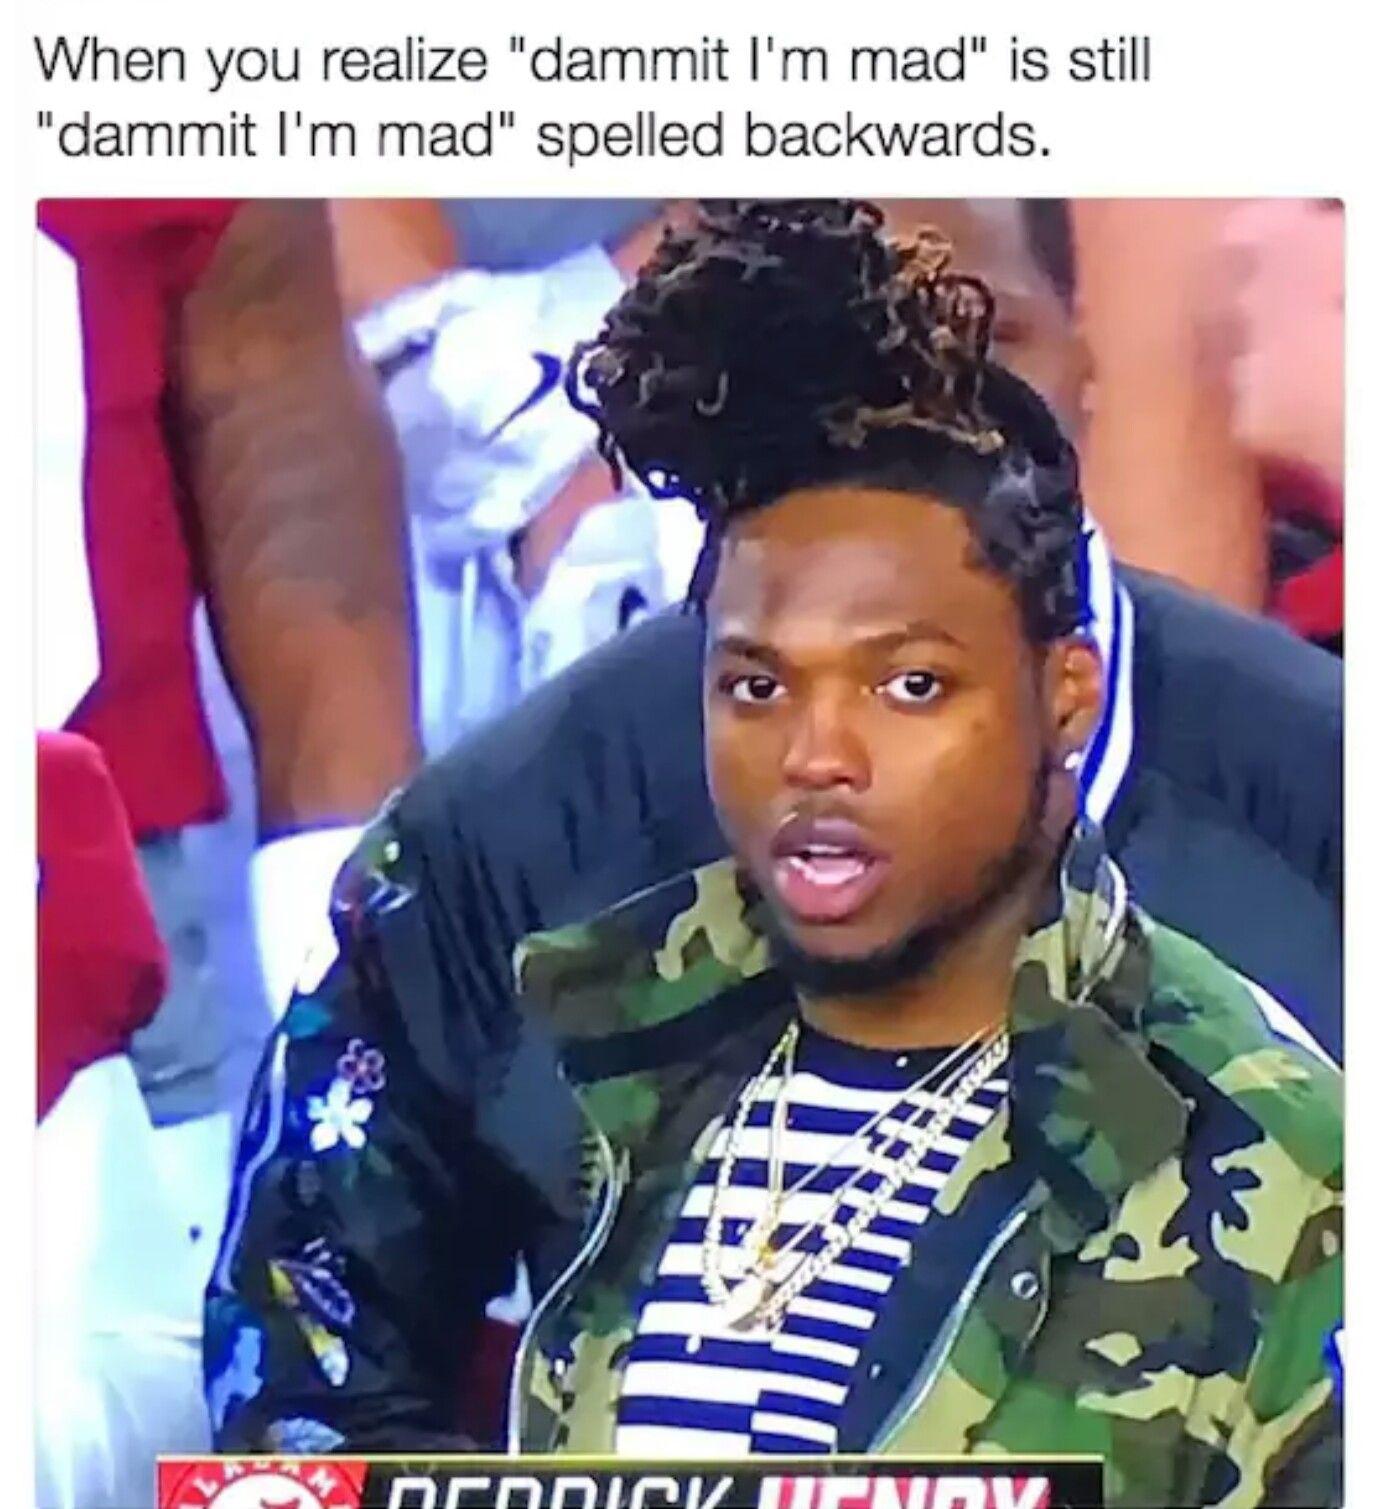 damn it im mad